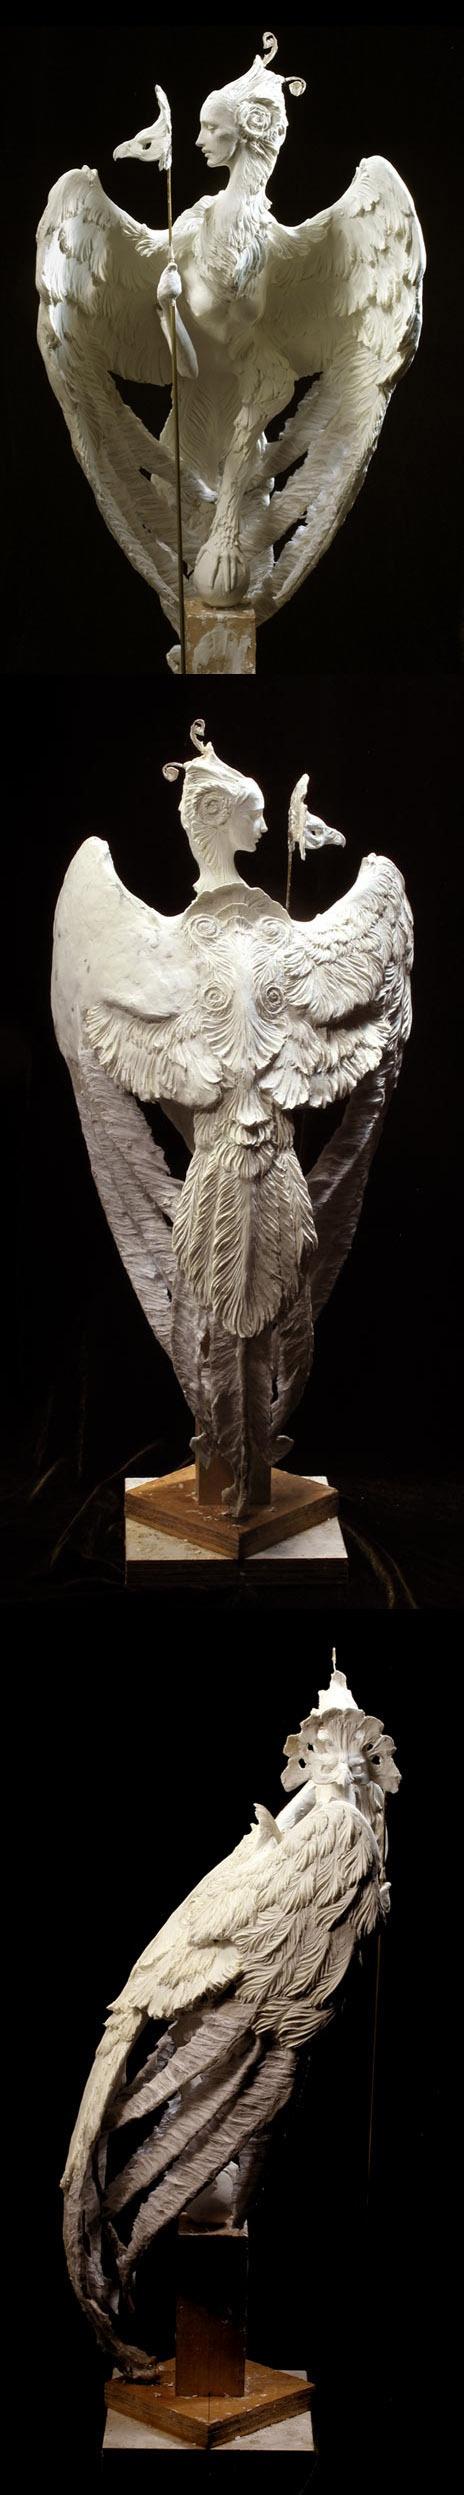 Forest.Rogers - Venetian Harpy